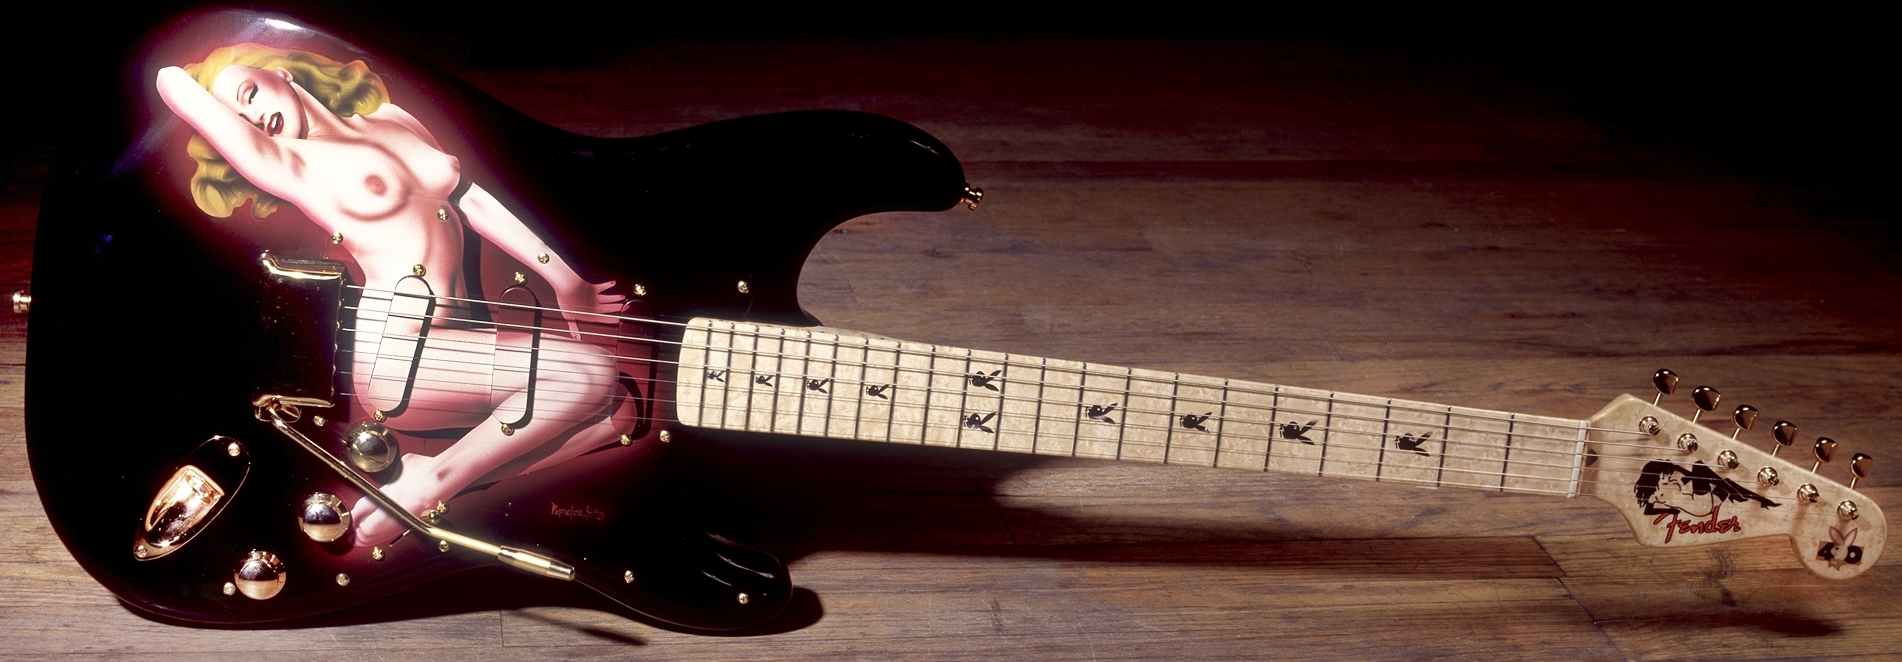 Fender Custom Shop Playboy Marilyn Monroe Stratocaster